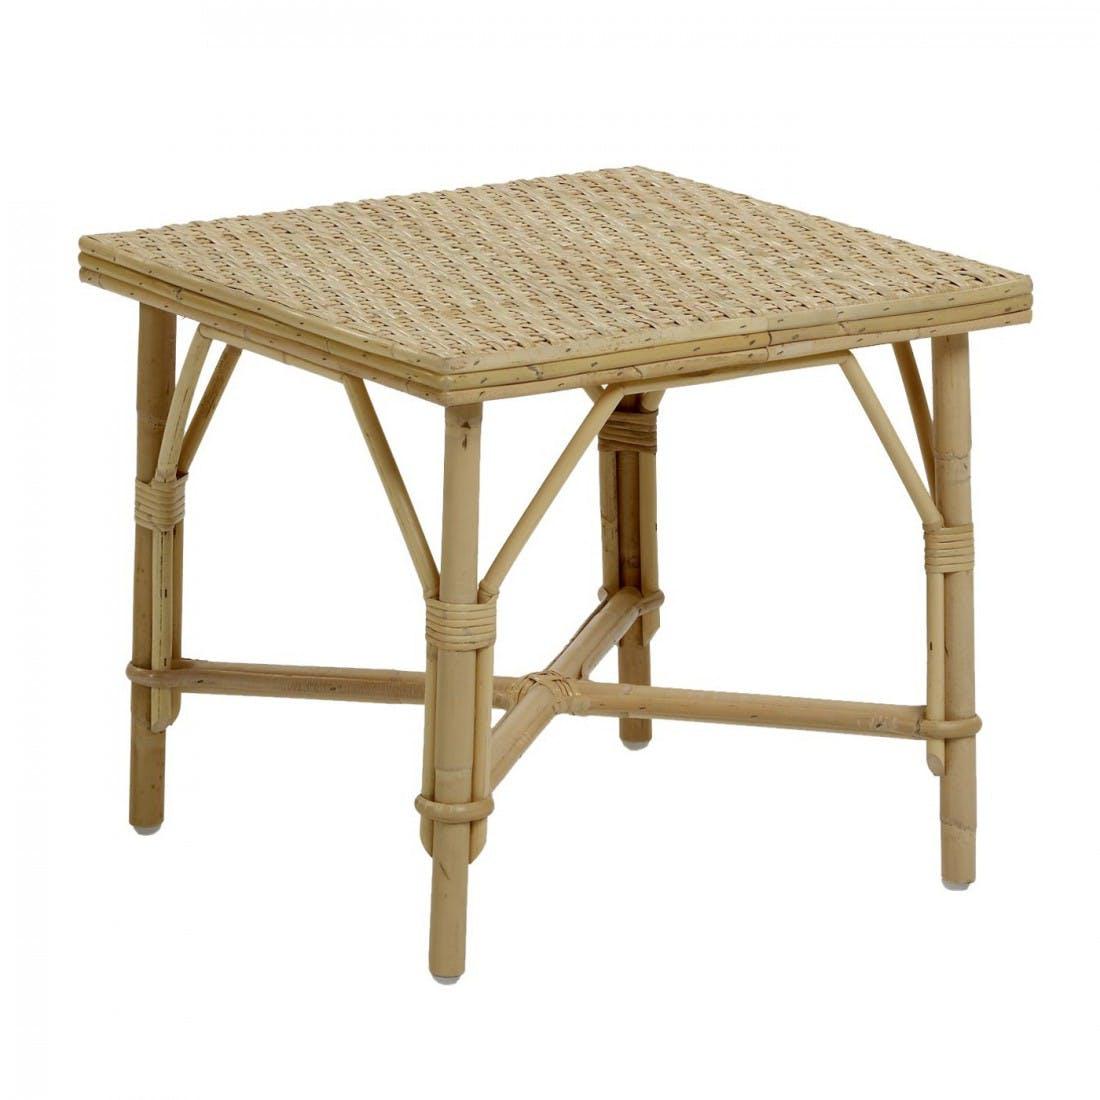 Petite table basse carrée rotin naturel Grand-mère KOK